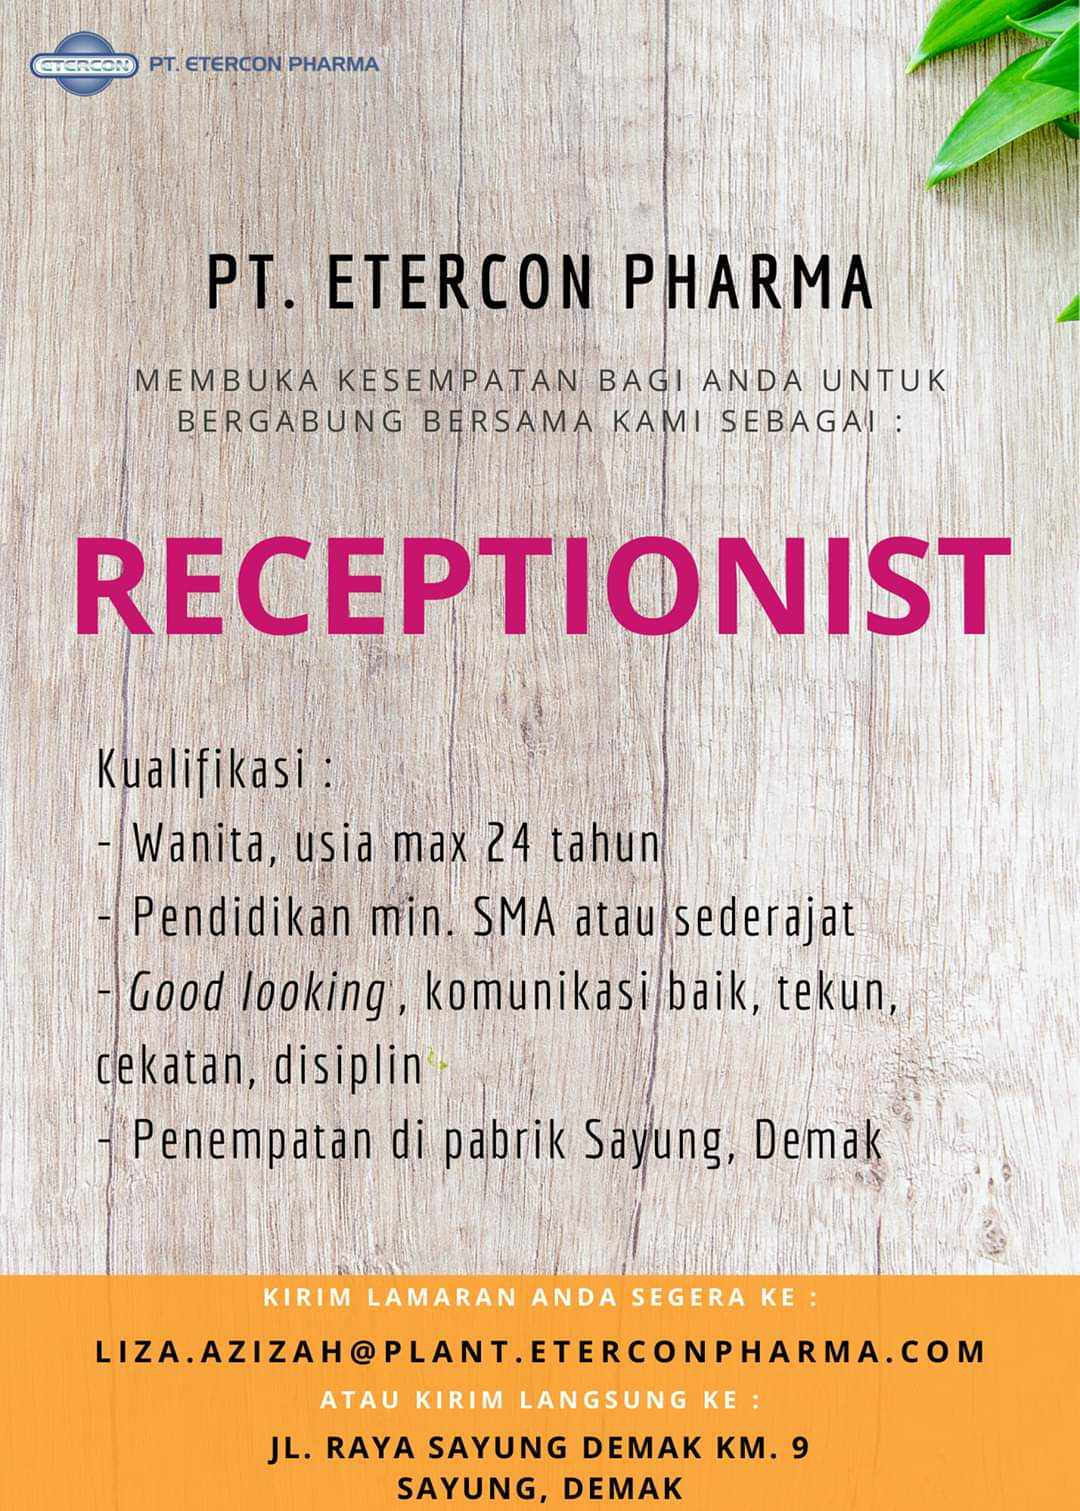 Lowongan Kerja Semarang di PT Etercon Pharma berdiri sejak tahun 2007, merupakan sebuah perusahaan yang bergerak di bidang farmasi dan berkedudukan di Sayung Demak – Semarang.